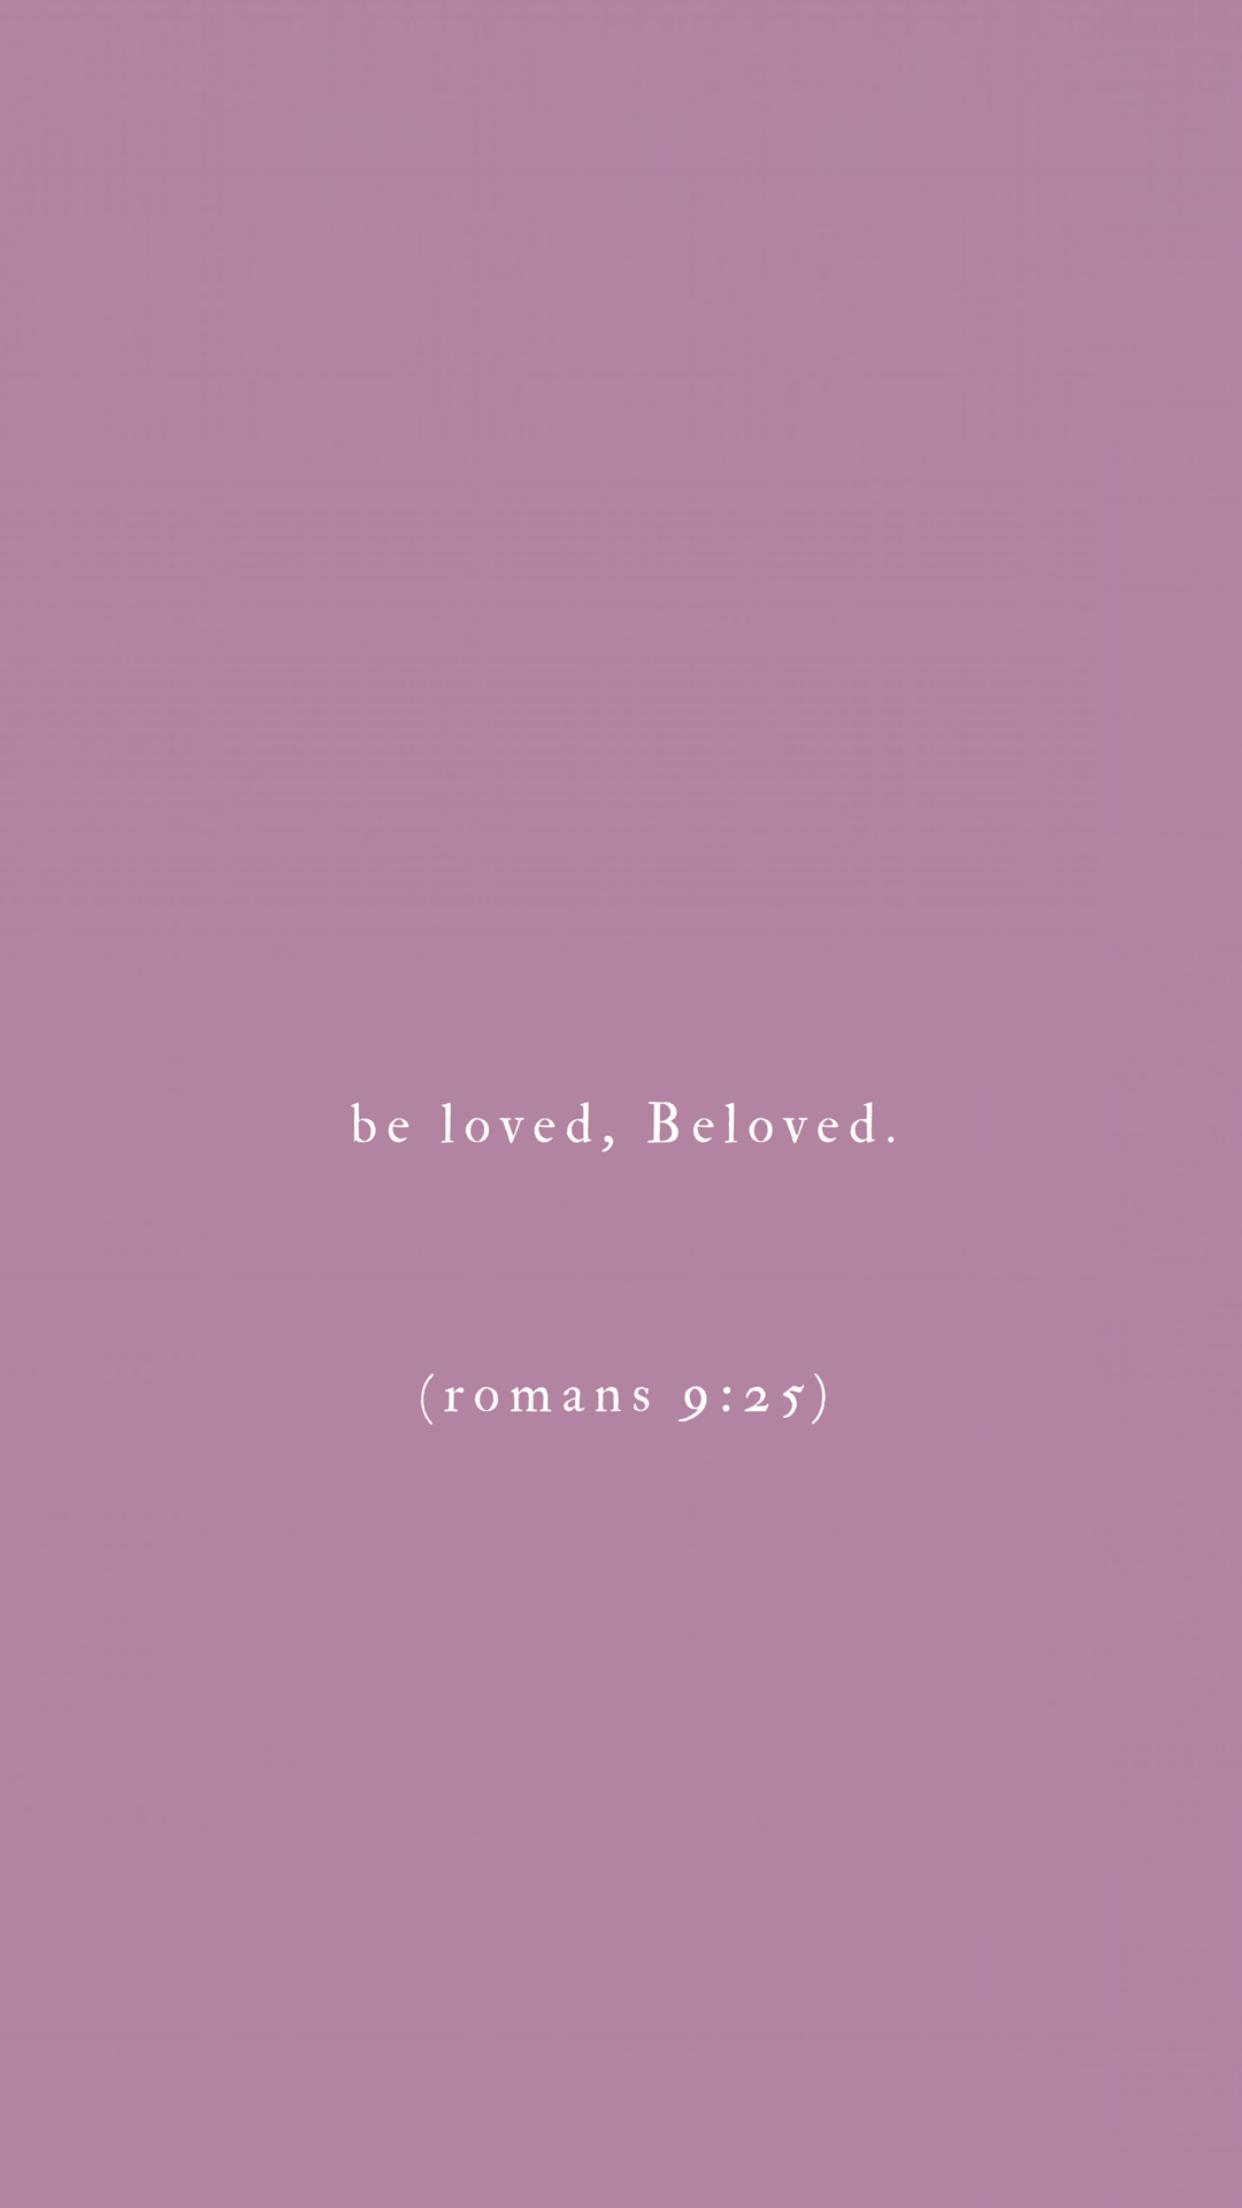 3a9ebe0225e Romans 9:25 | Christian quotes for women | Jordan Lee | theSoulScripts.com